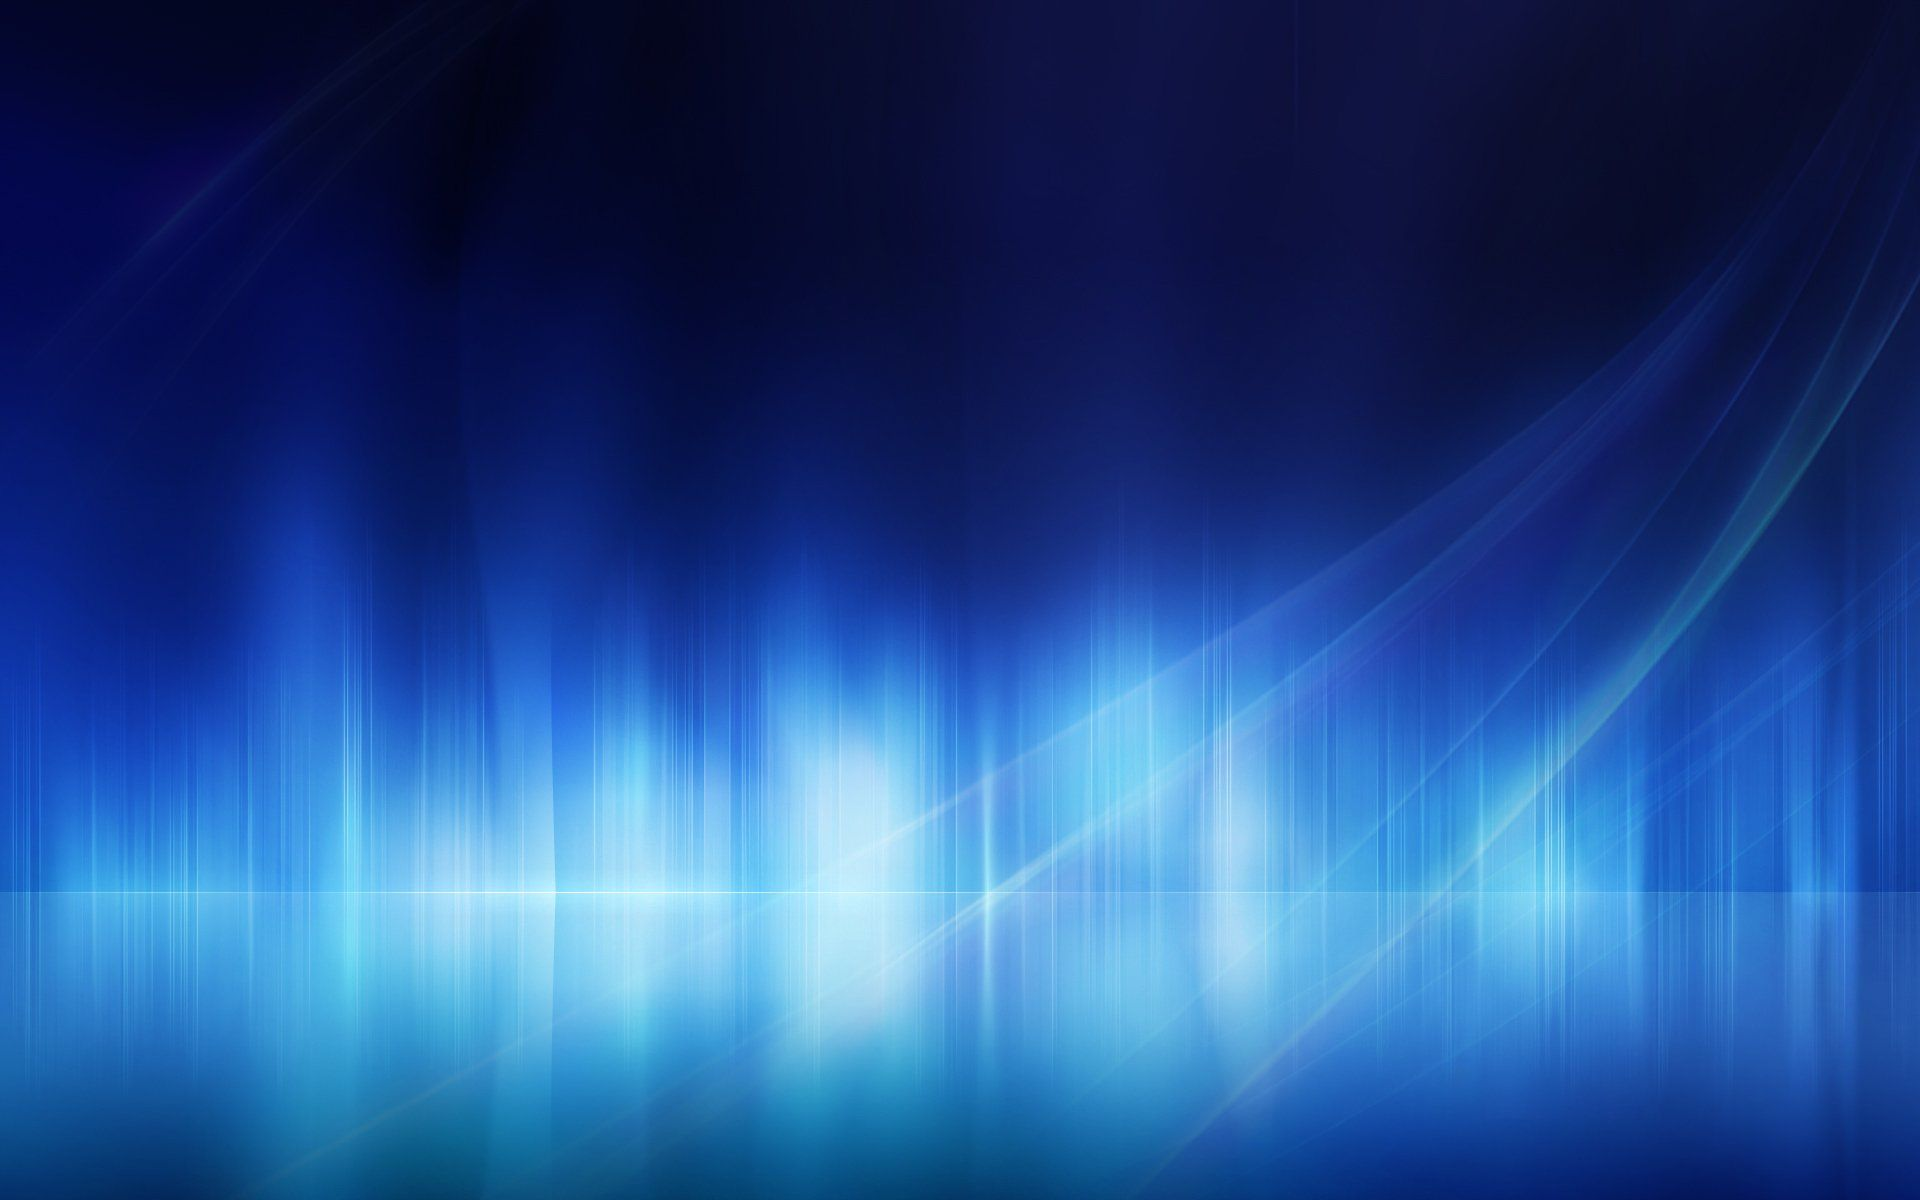 Blue Themed Desktop Wallpaper Blue background wallpapers